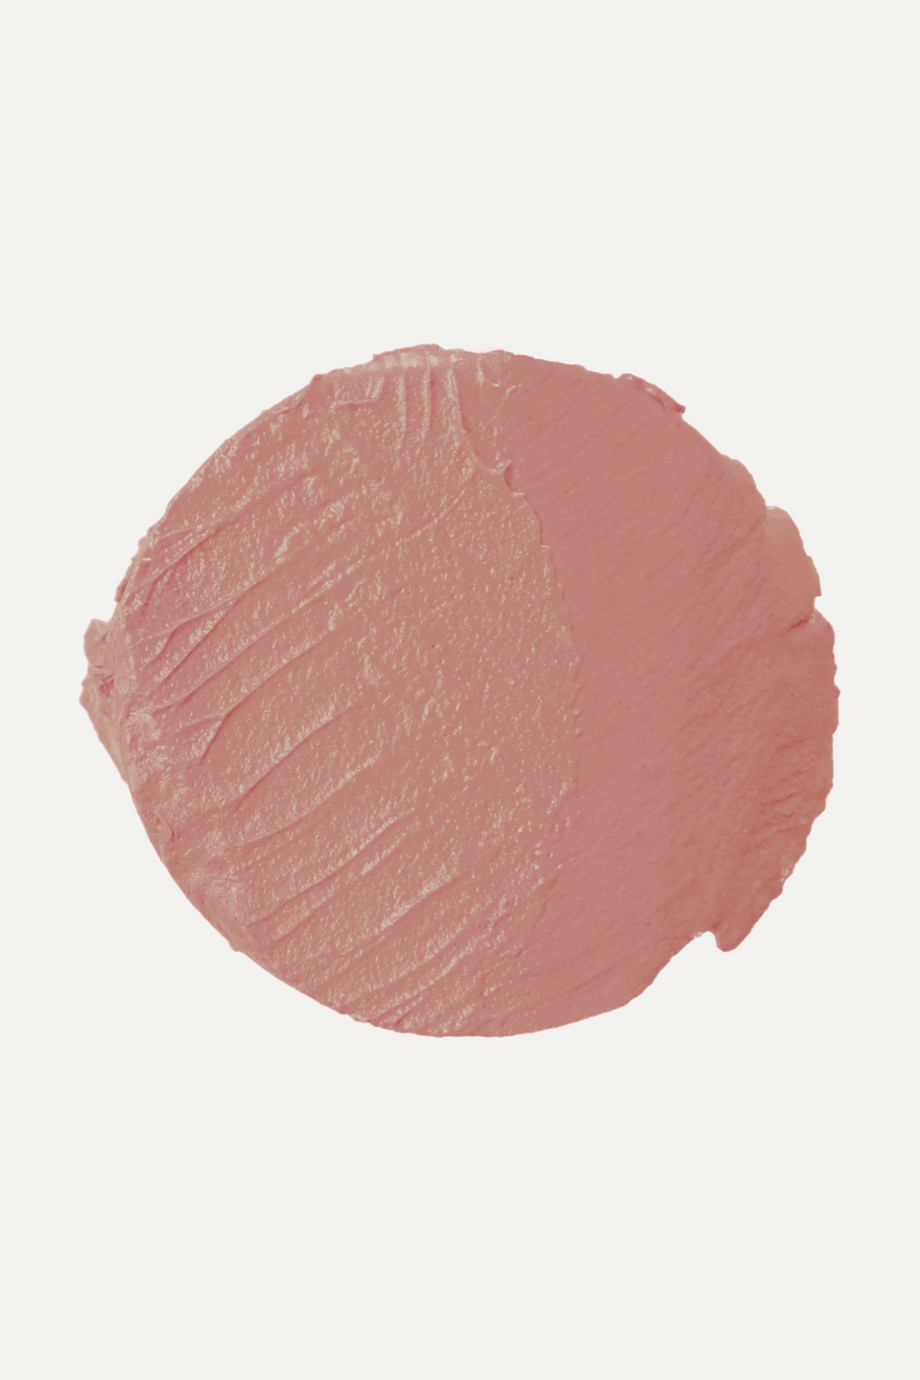 NARS Lipstick - Pour Toujours